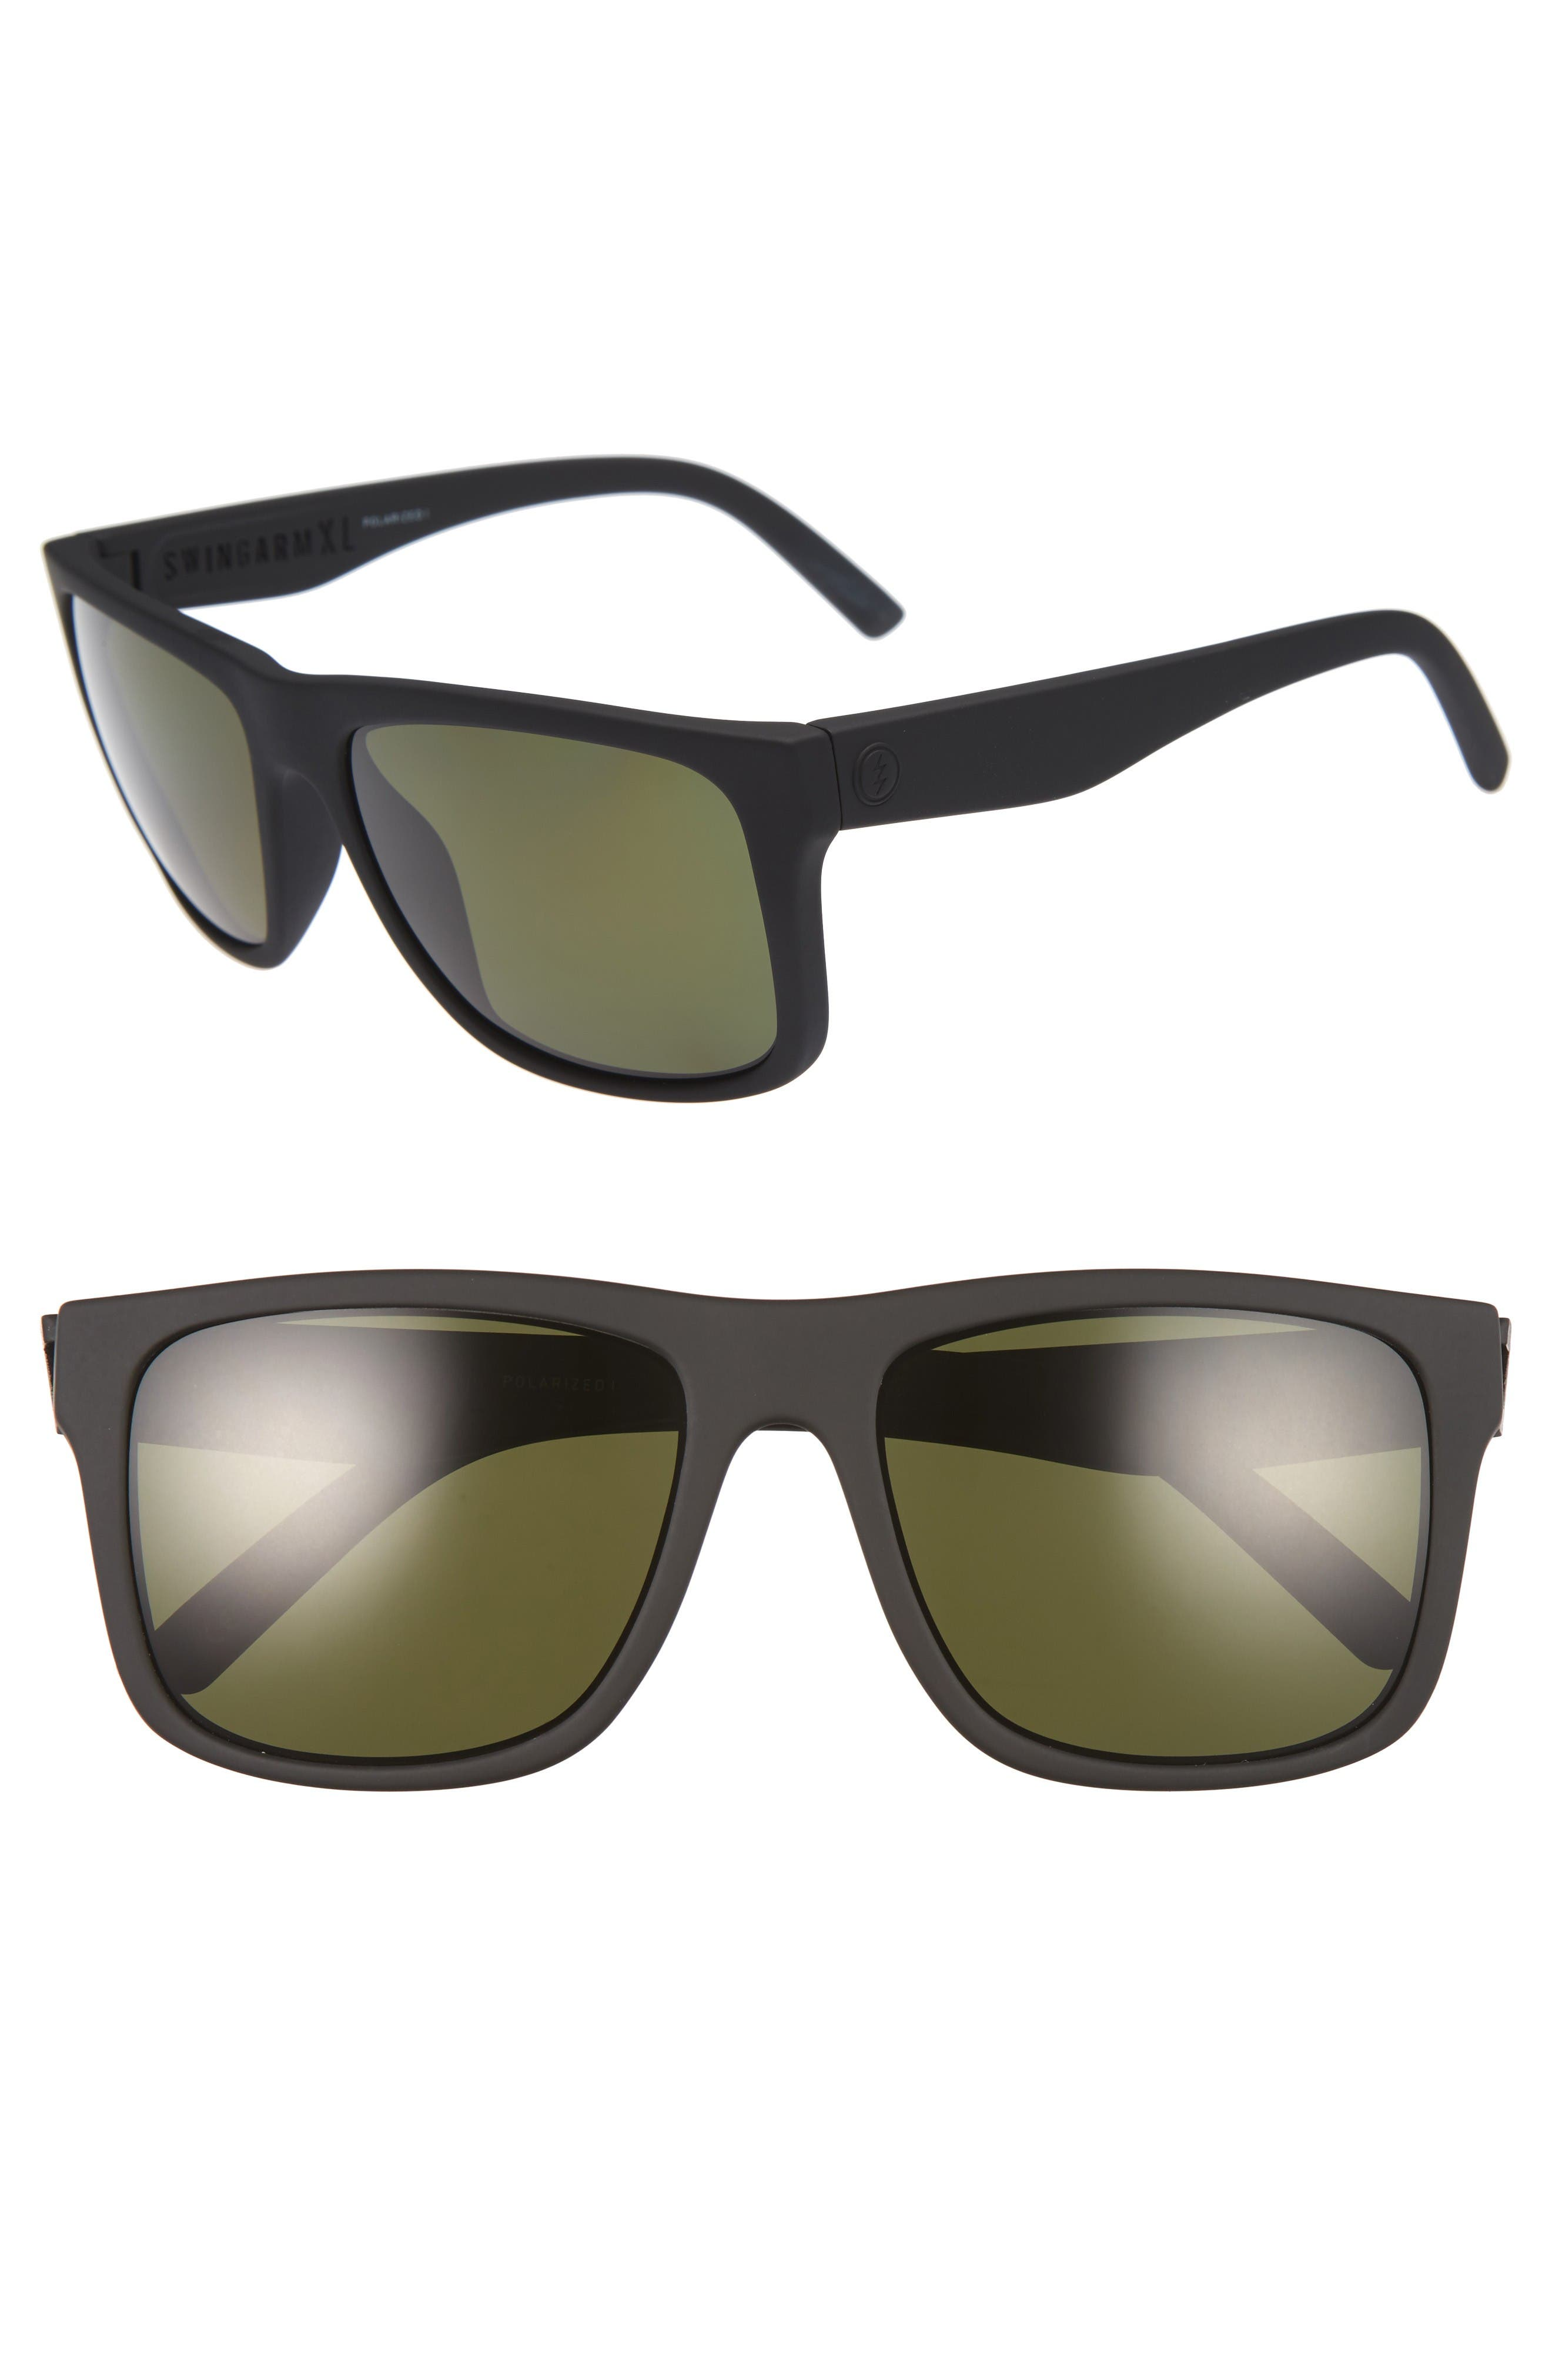 ELECTRIC Swingarm XL 59mm Polarized Sunglasses